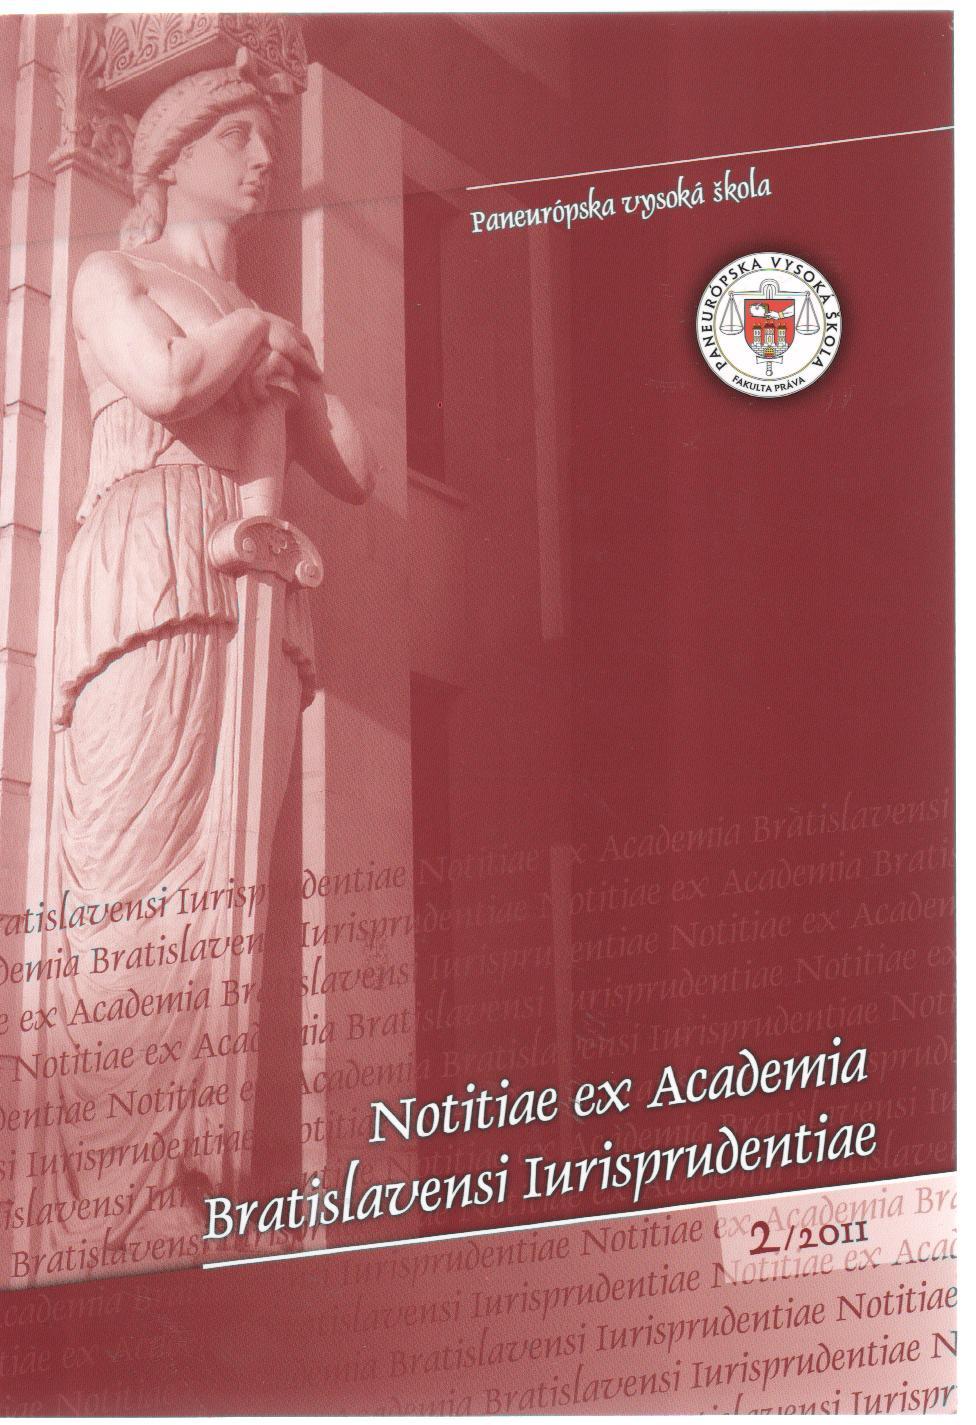 Notitiae ex Academia Bratislavensi Iurisprudentiae 2/2011 - Vedecký časopis BVŠP